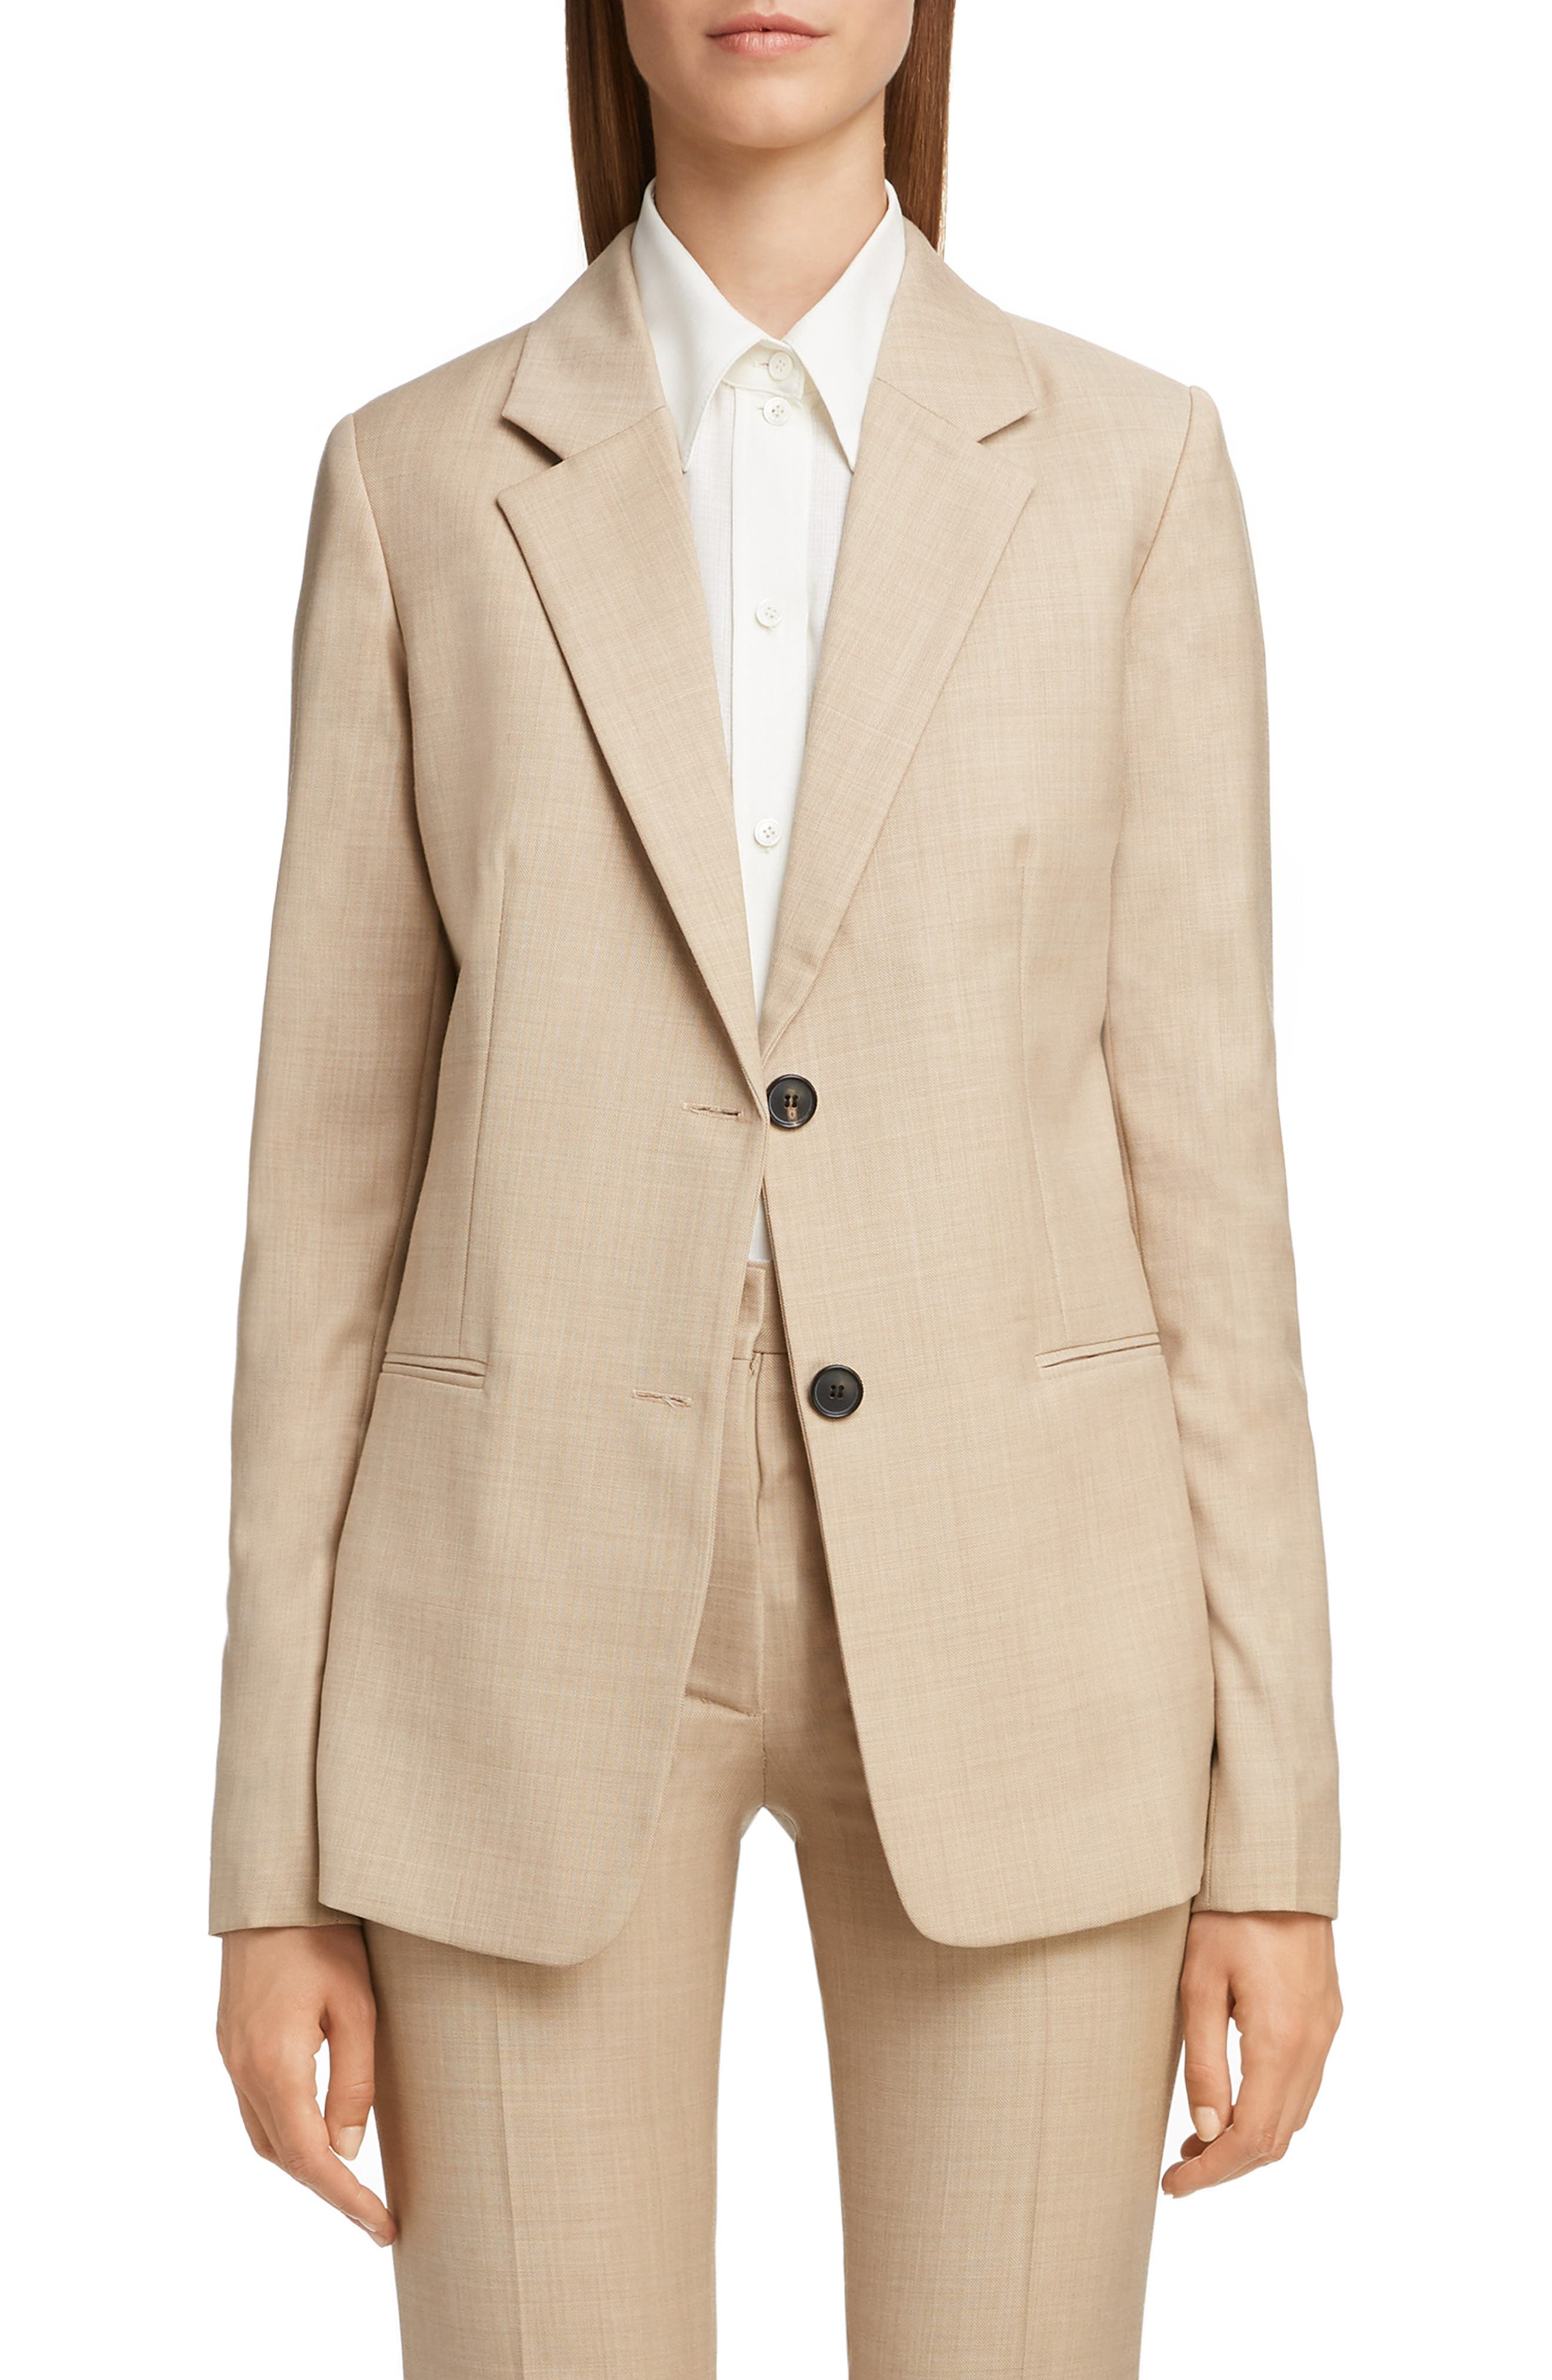 Wool Jacket, Main, color, LIGHT BEIGE-WHITE